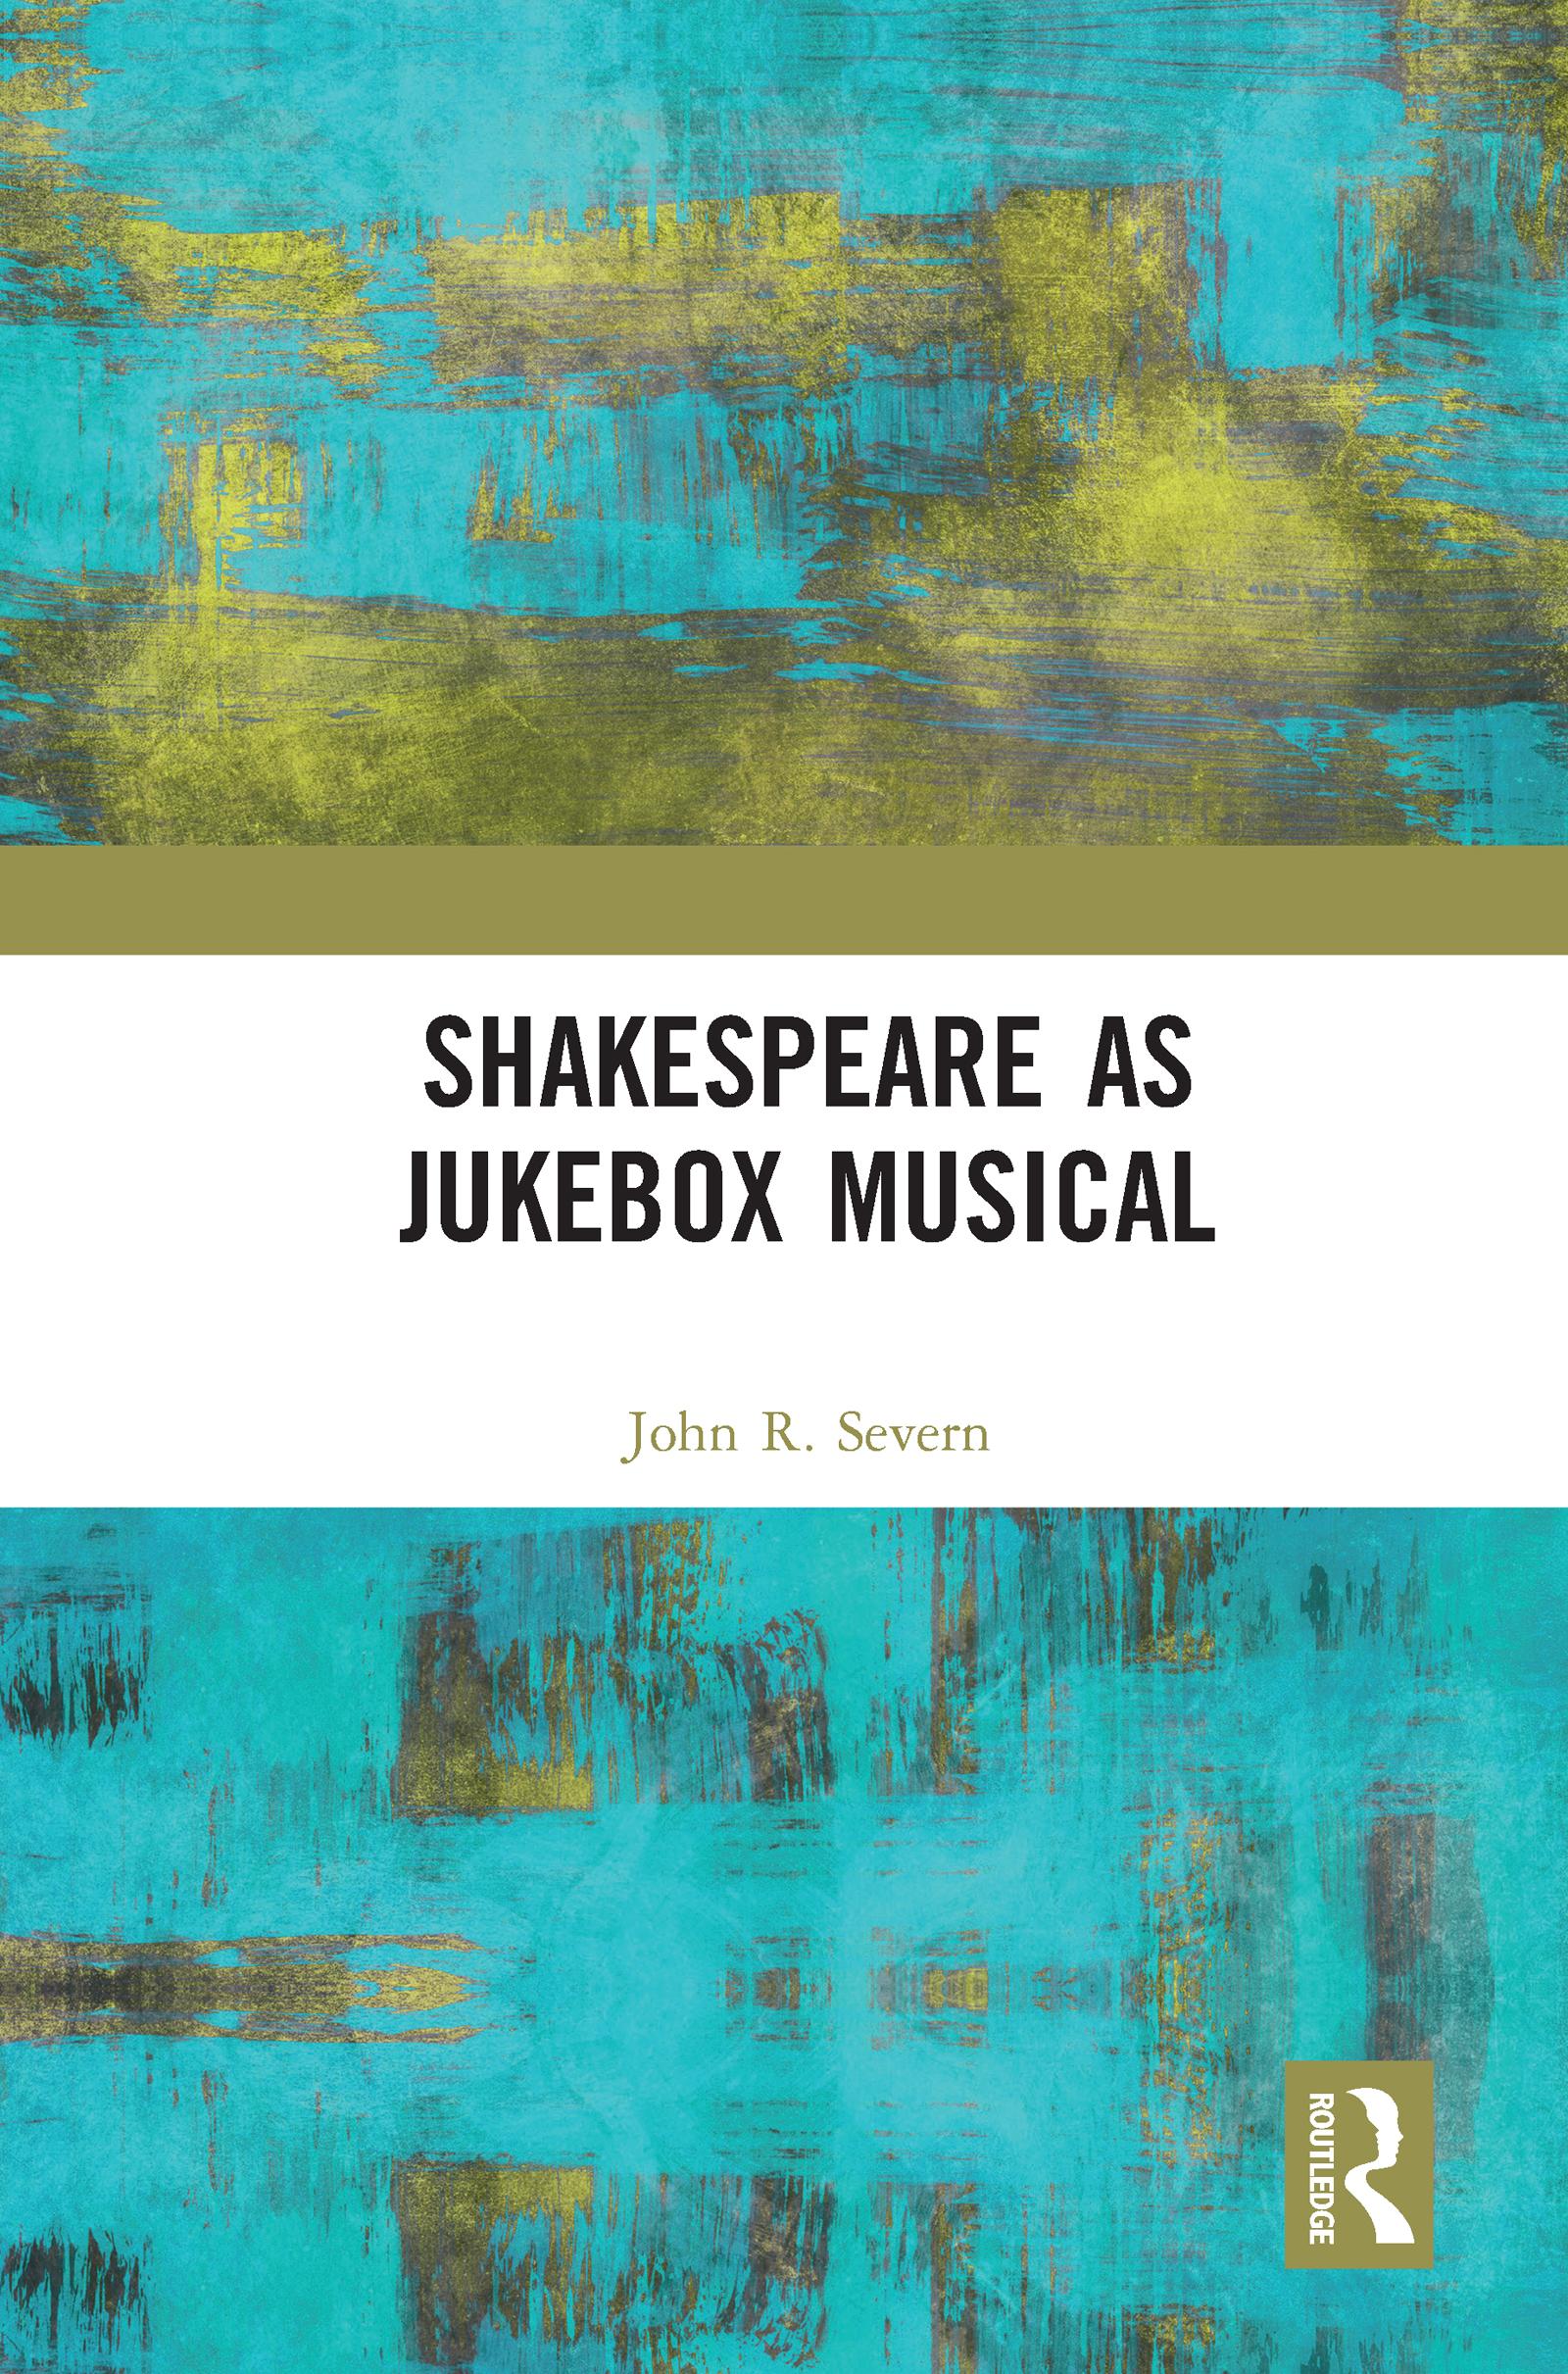 Shakespeare as Jukebox Musical